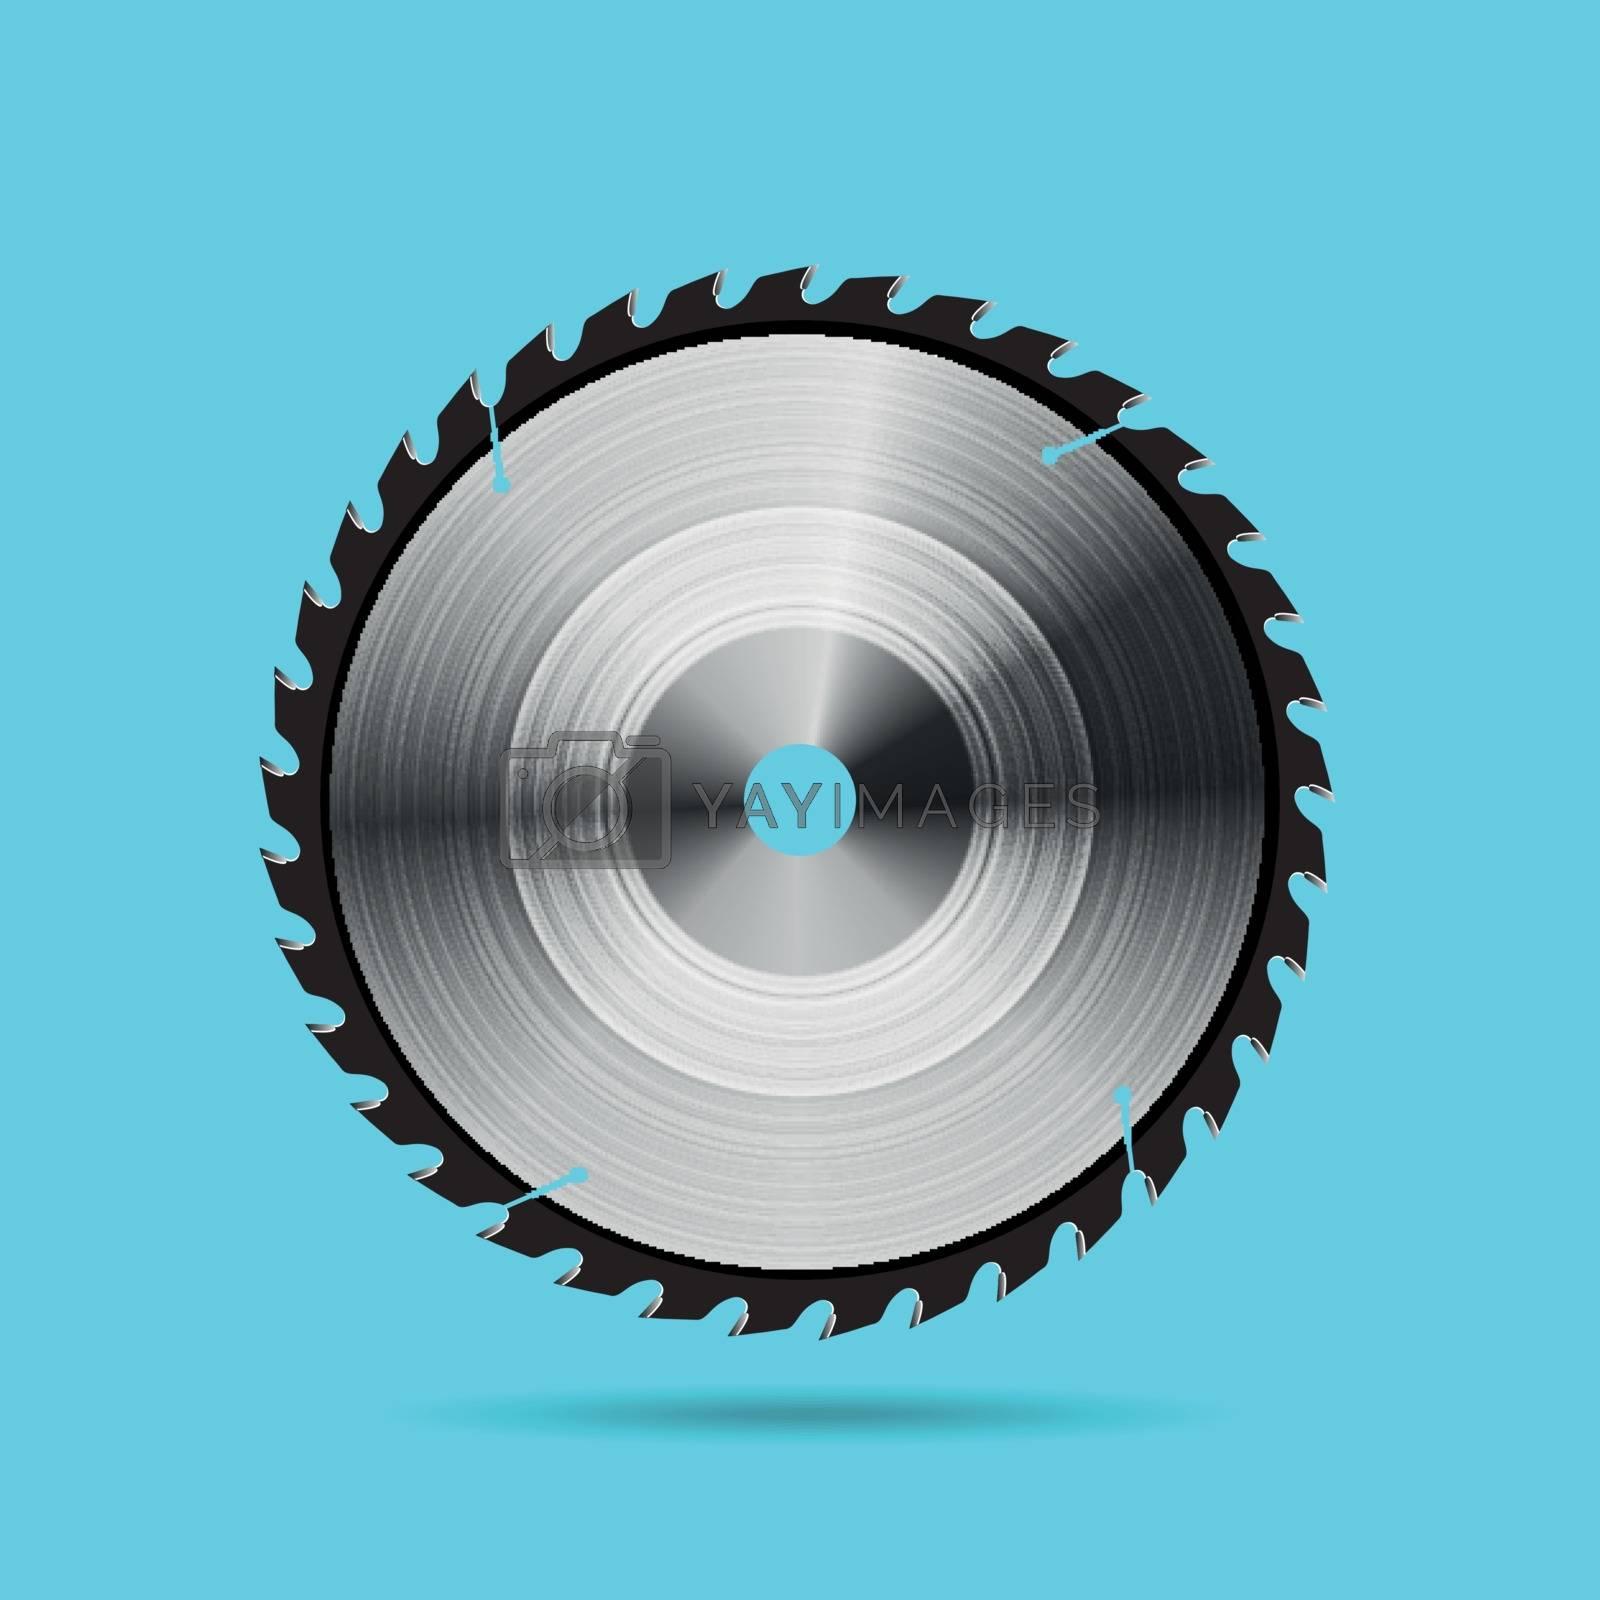 Circular saw blade on blue background. Vector illustration